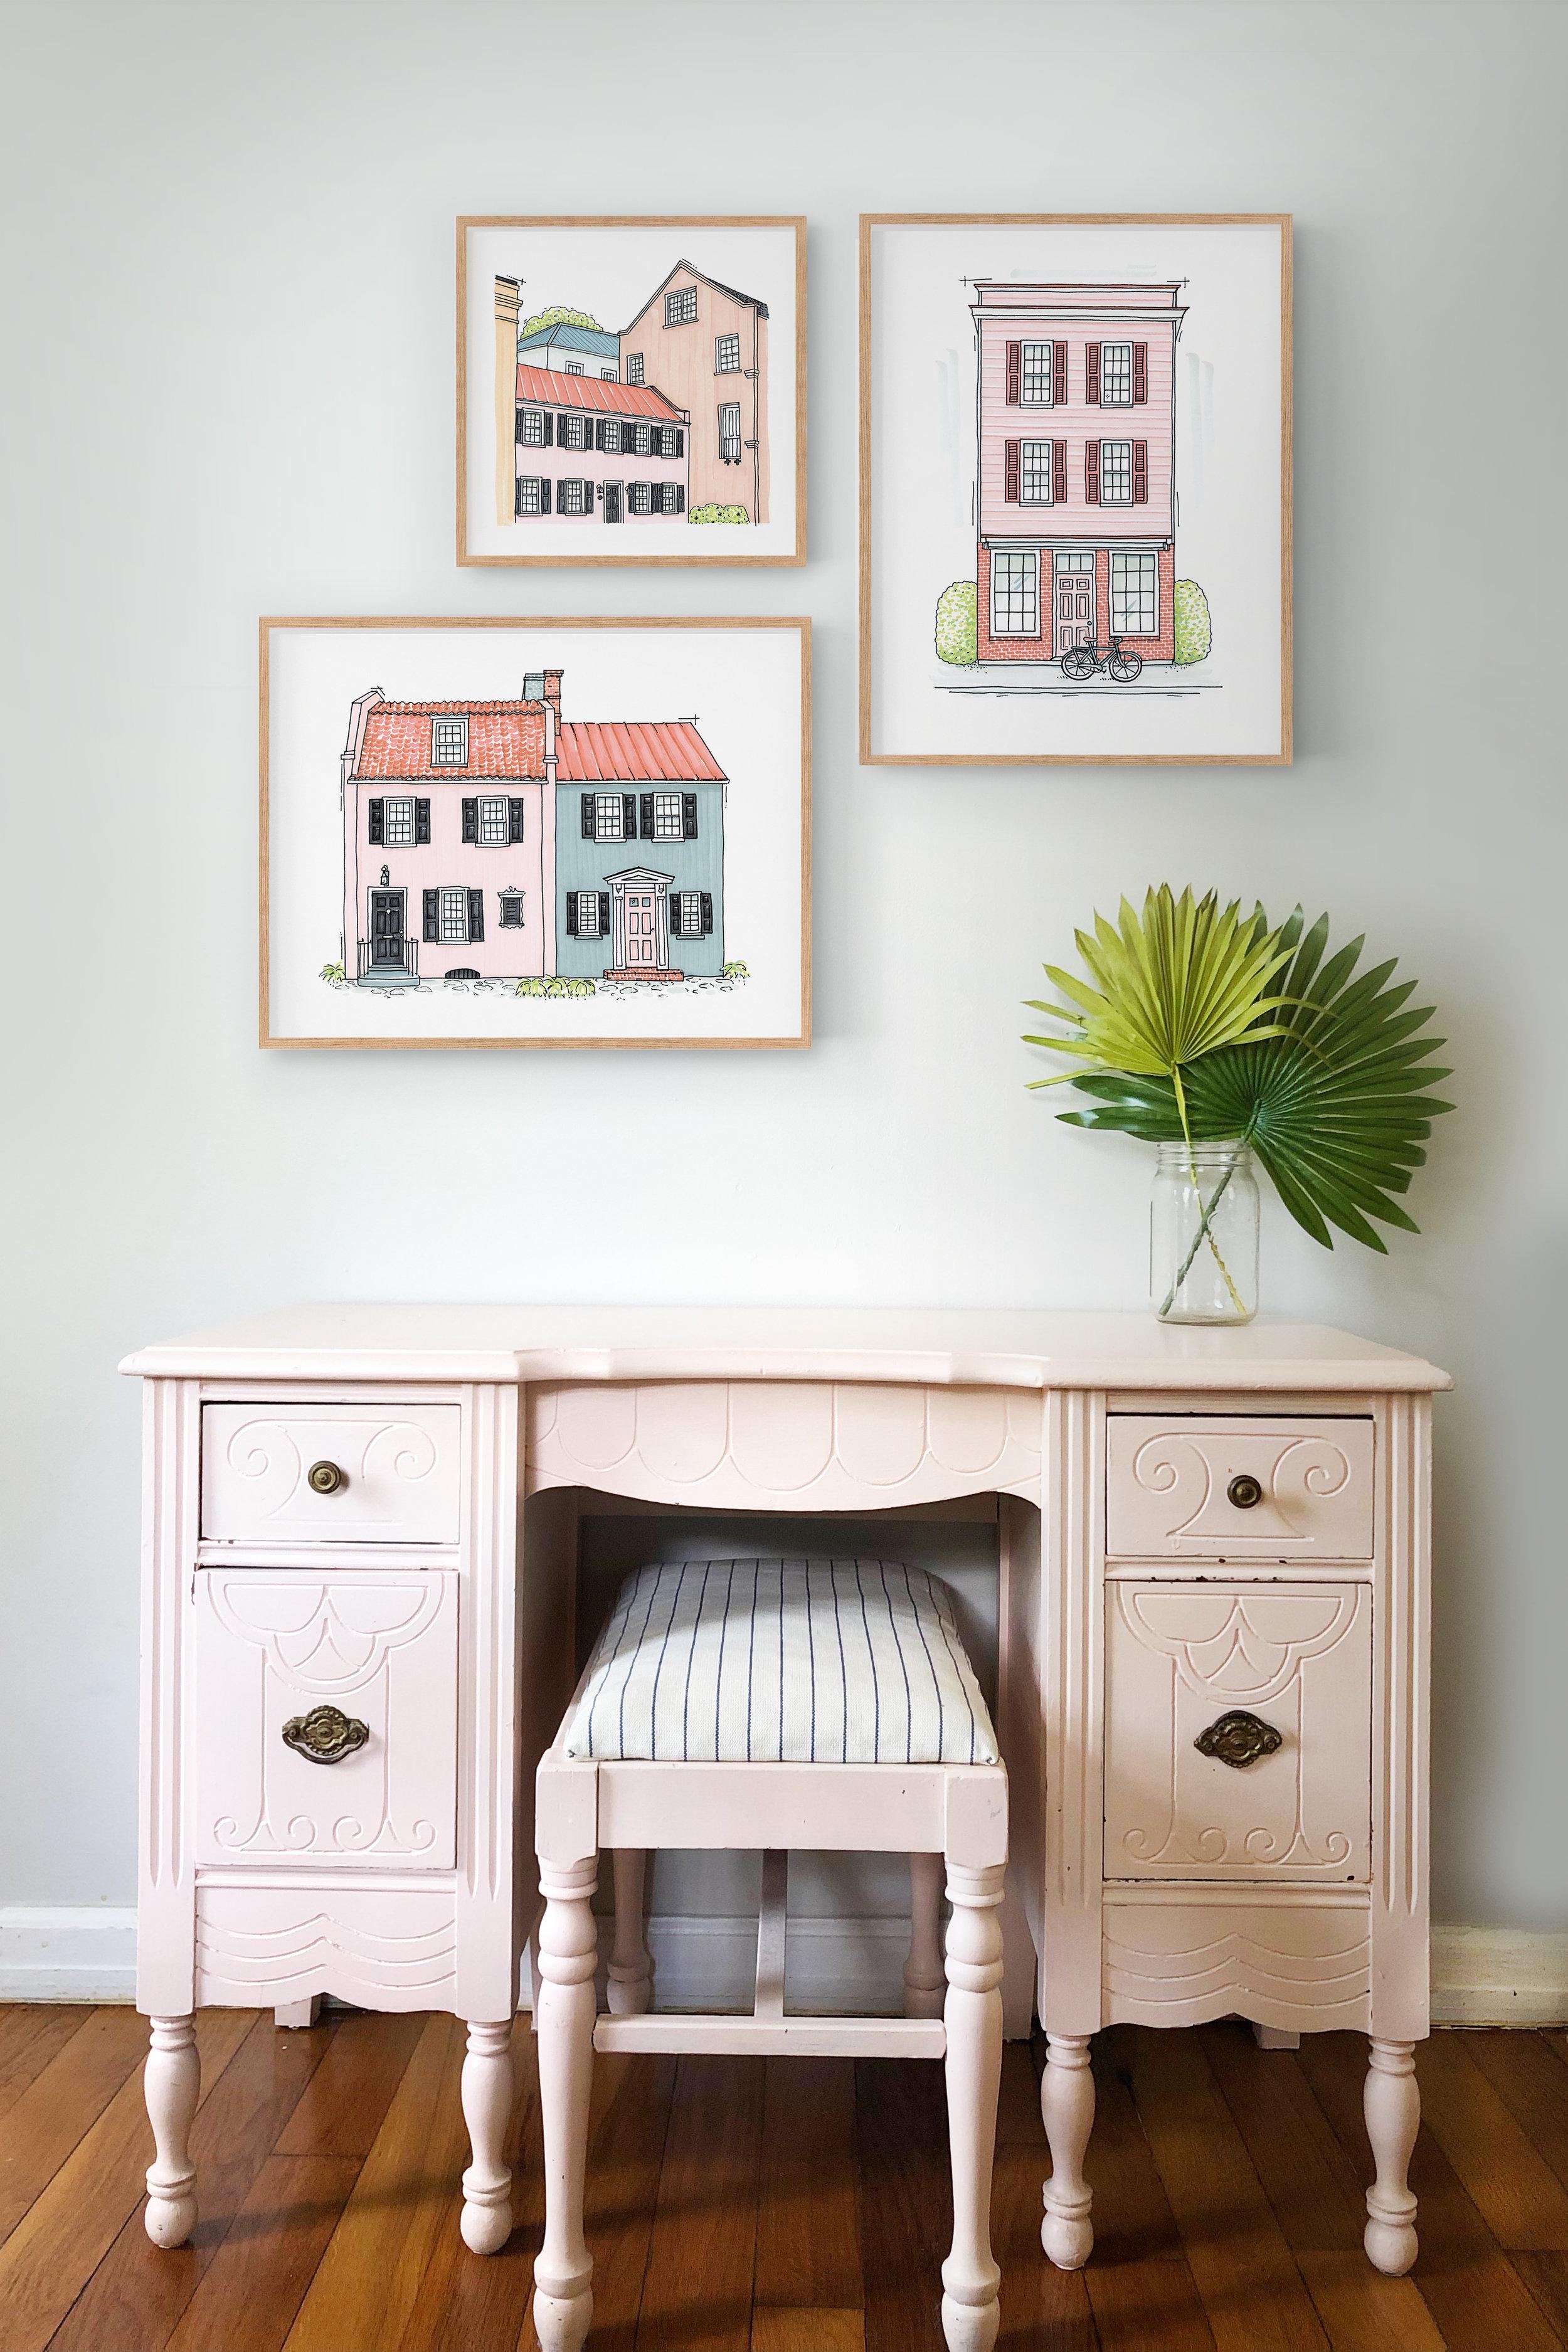 Architectural Art Print: Pink & Blue House [LIMITED EDITION]; Charleston Artwork; Girls room artwork; Whimsical Illustration